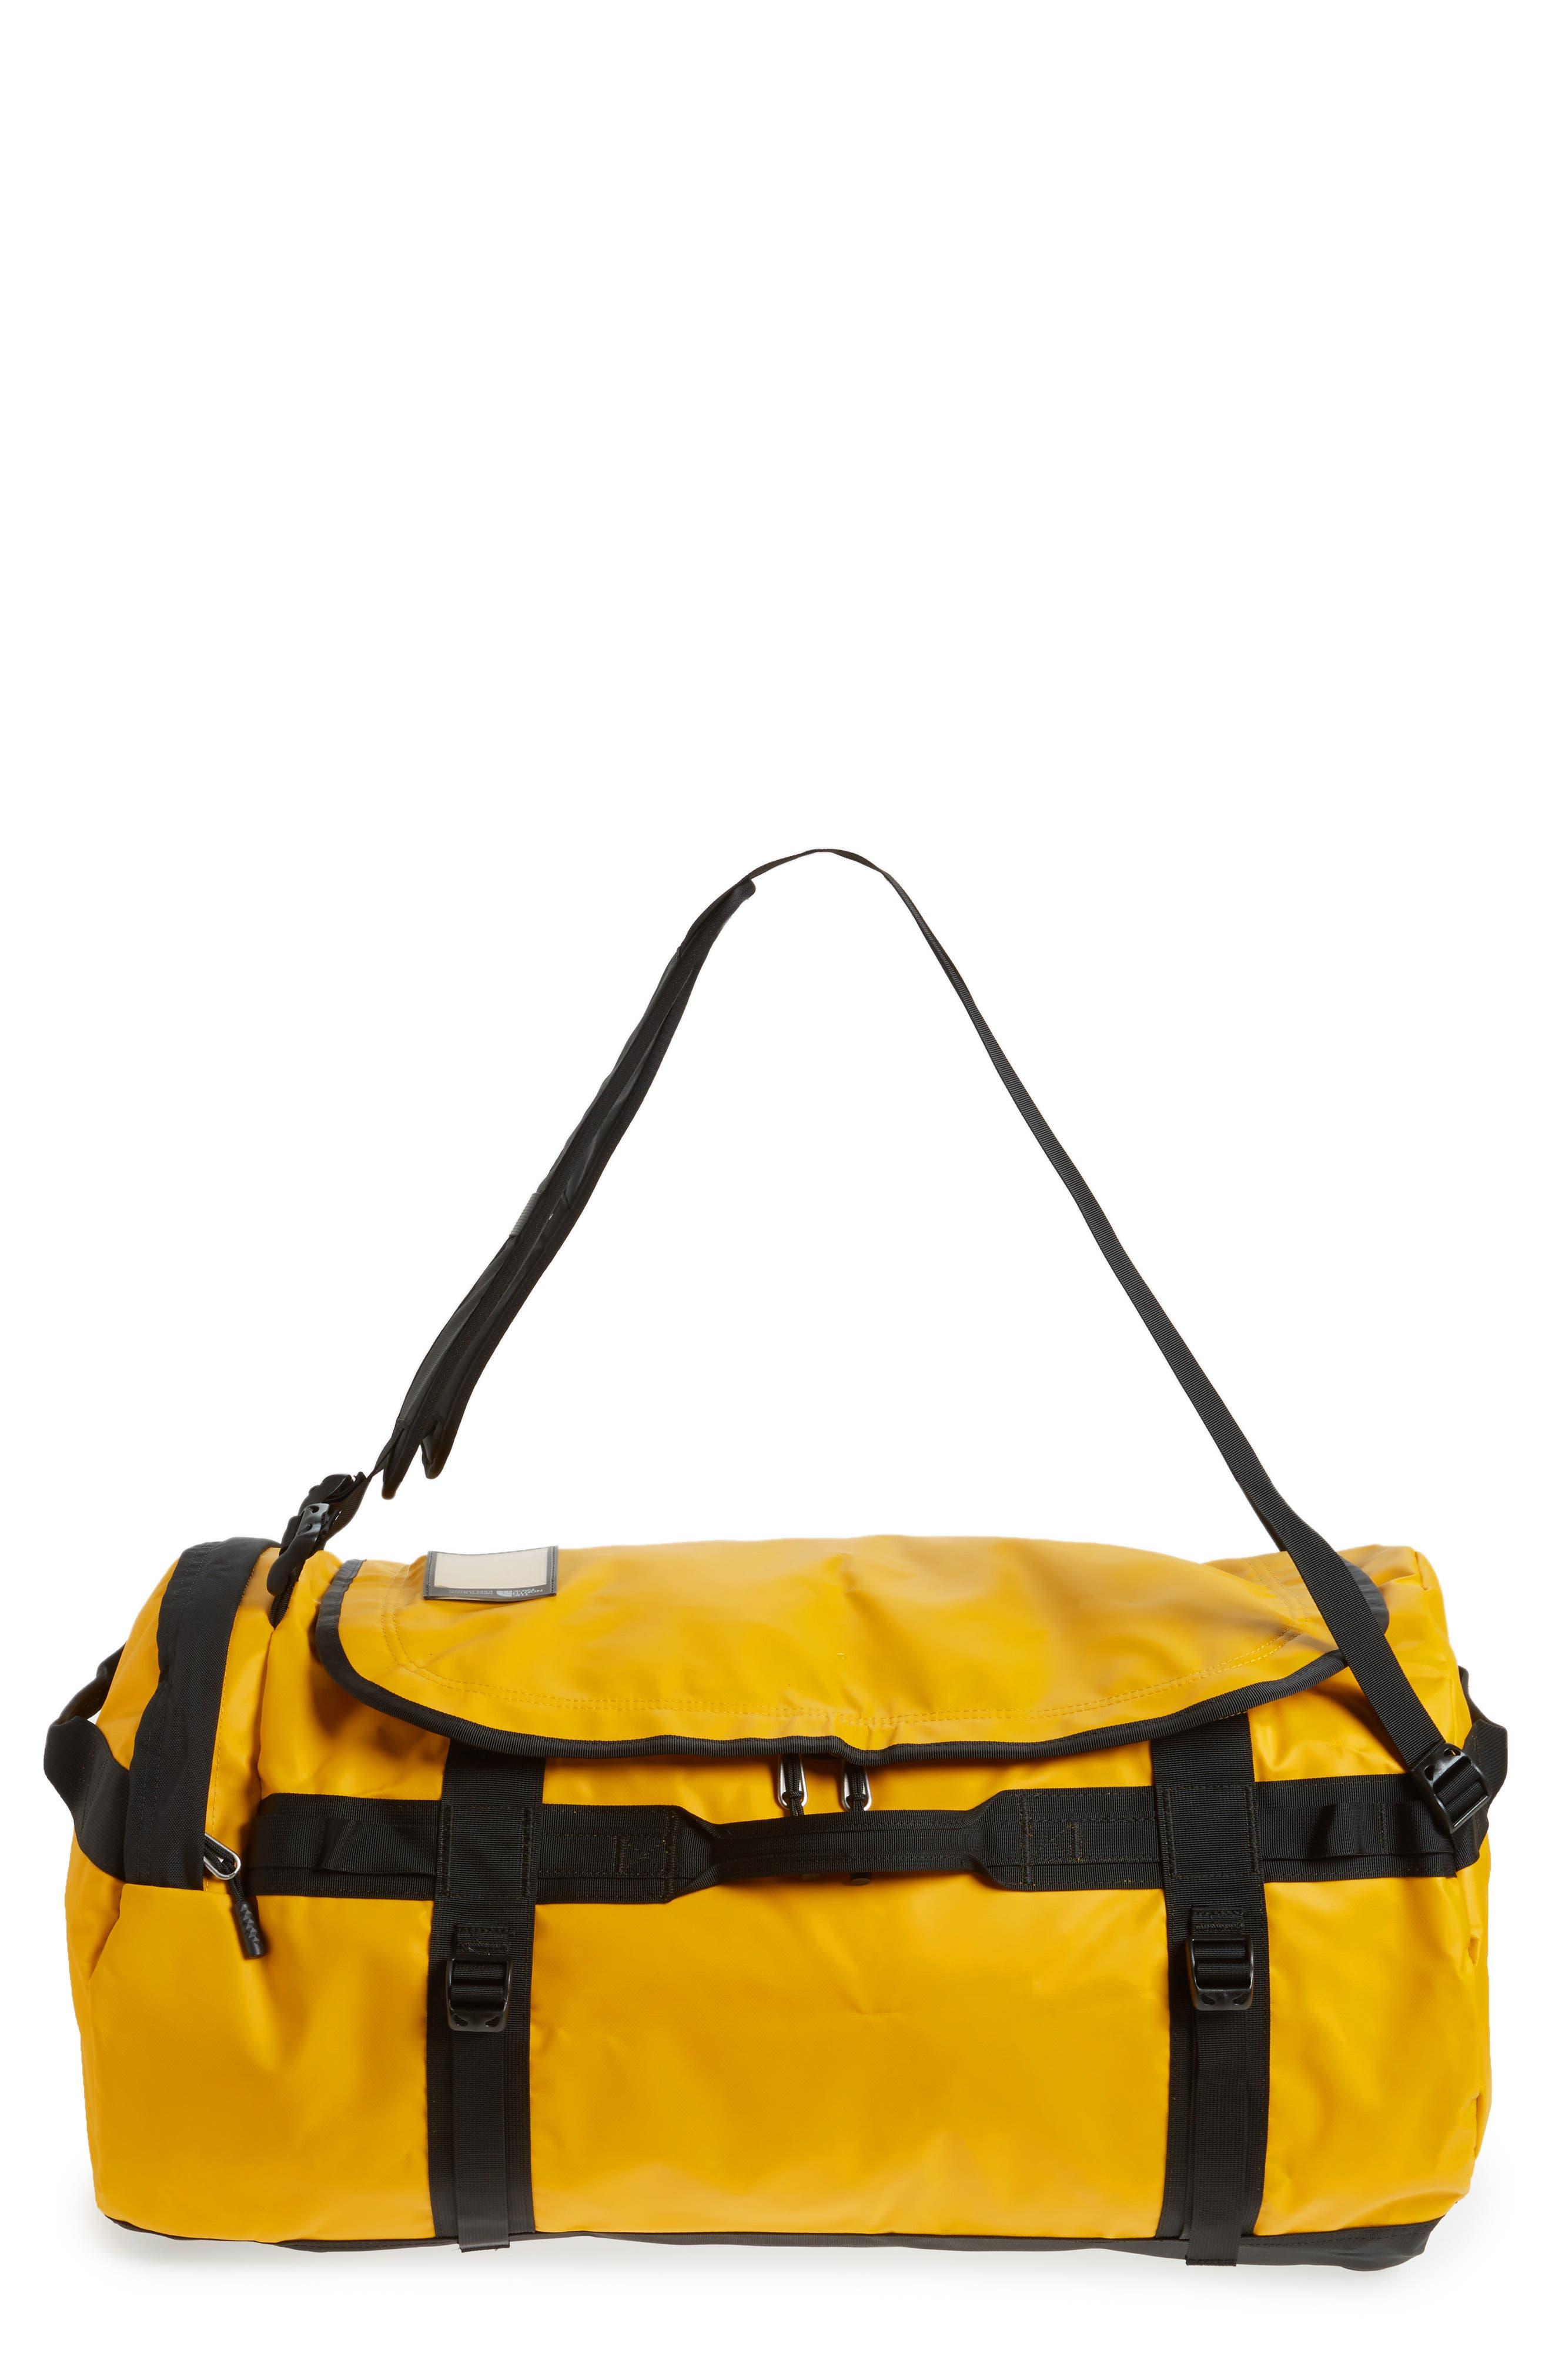 'Base Camp - Large' Duffel Bag,                             Main thumbnail 1, color,                             710